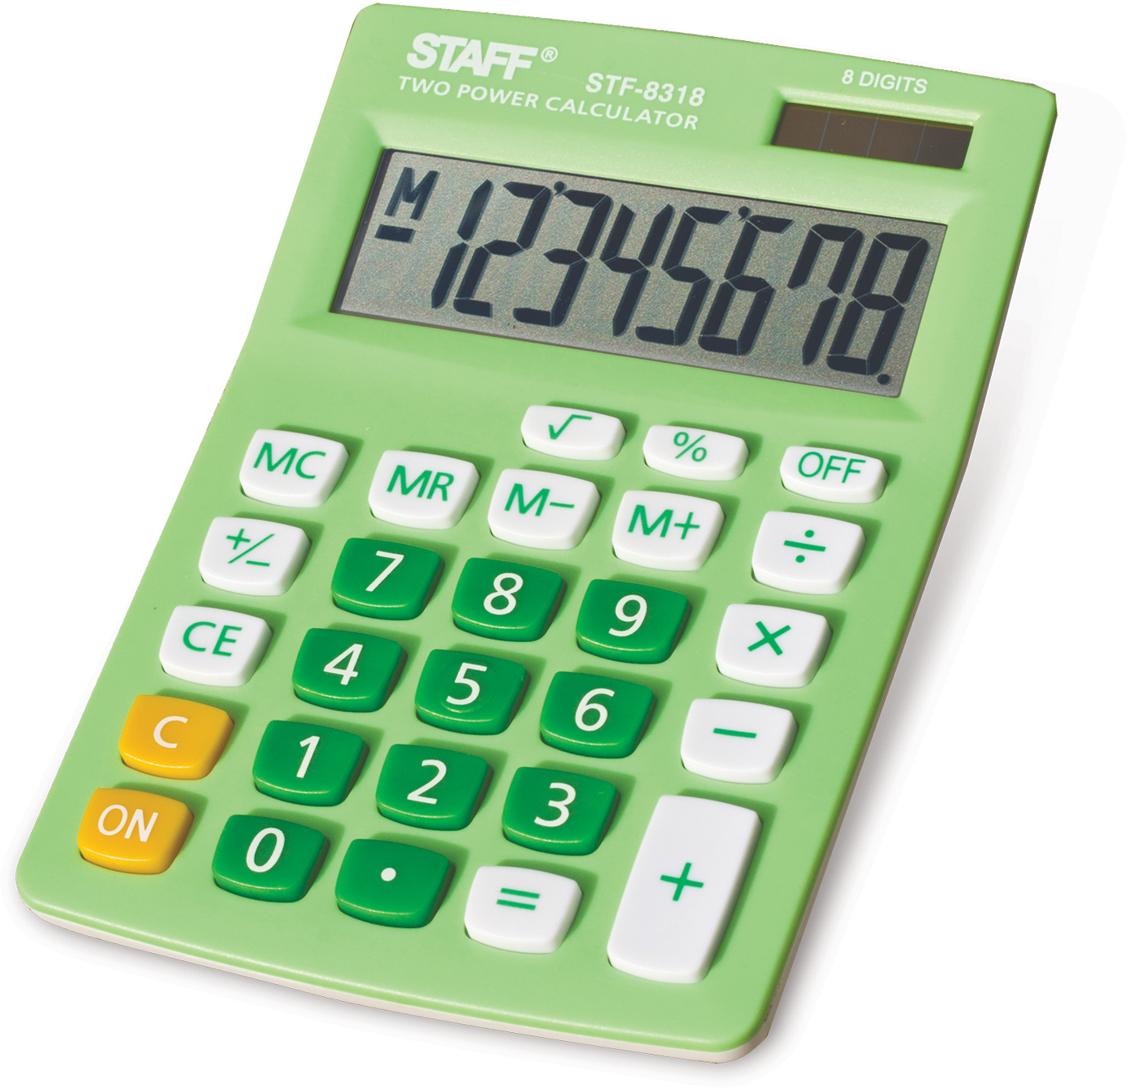 Калькулятор настольный Staff STF-8318, цвет: зеленый канцелярия staff калькулятор карманный stf 6238